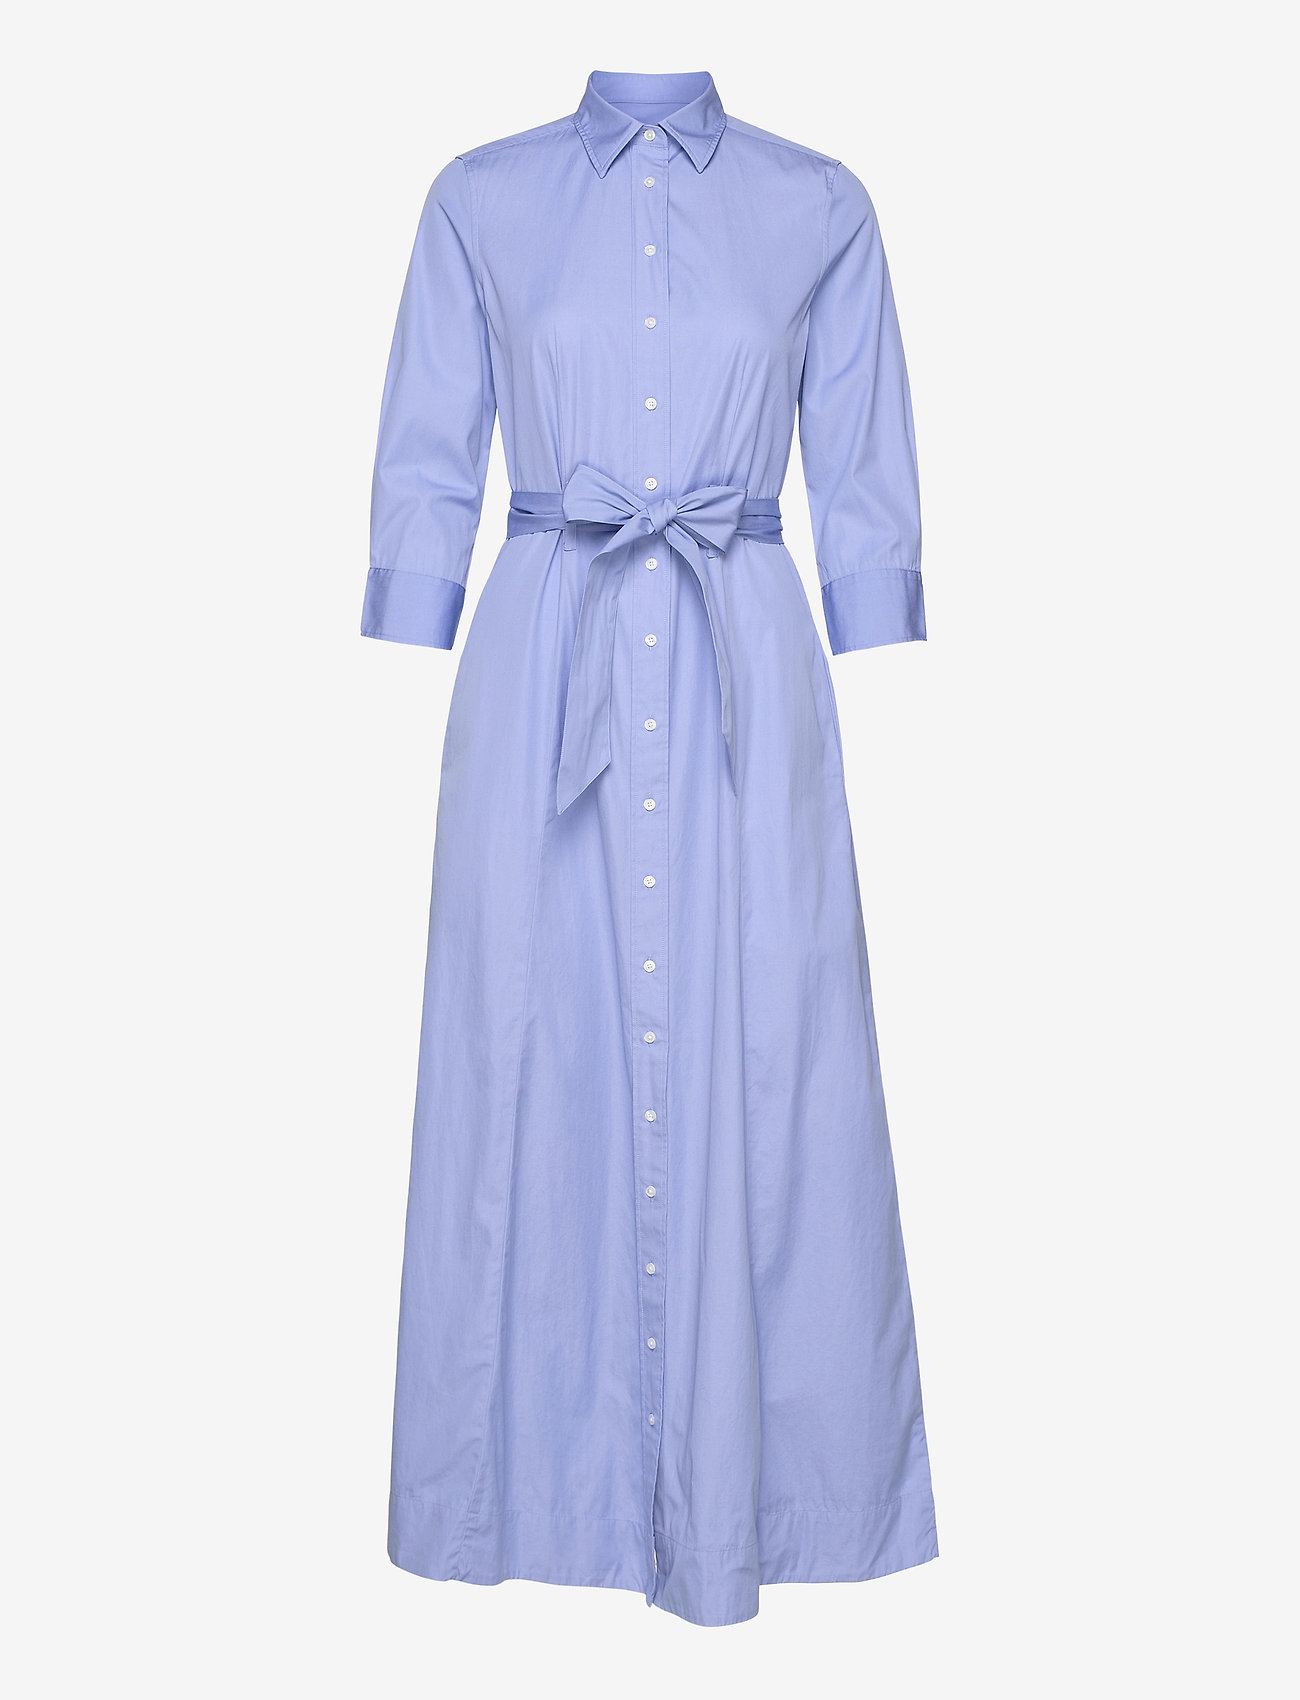 Gant - D2. MAXI SHIRT DRESS - shirt dresses - lavender blue